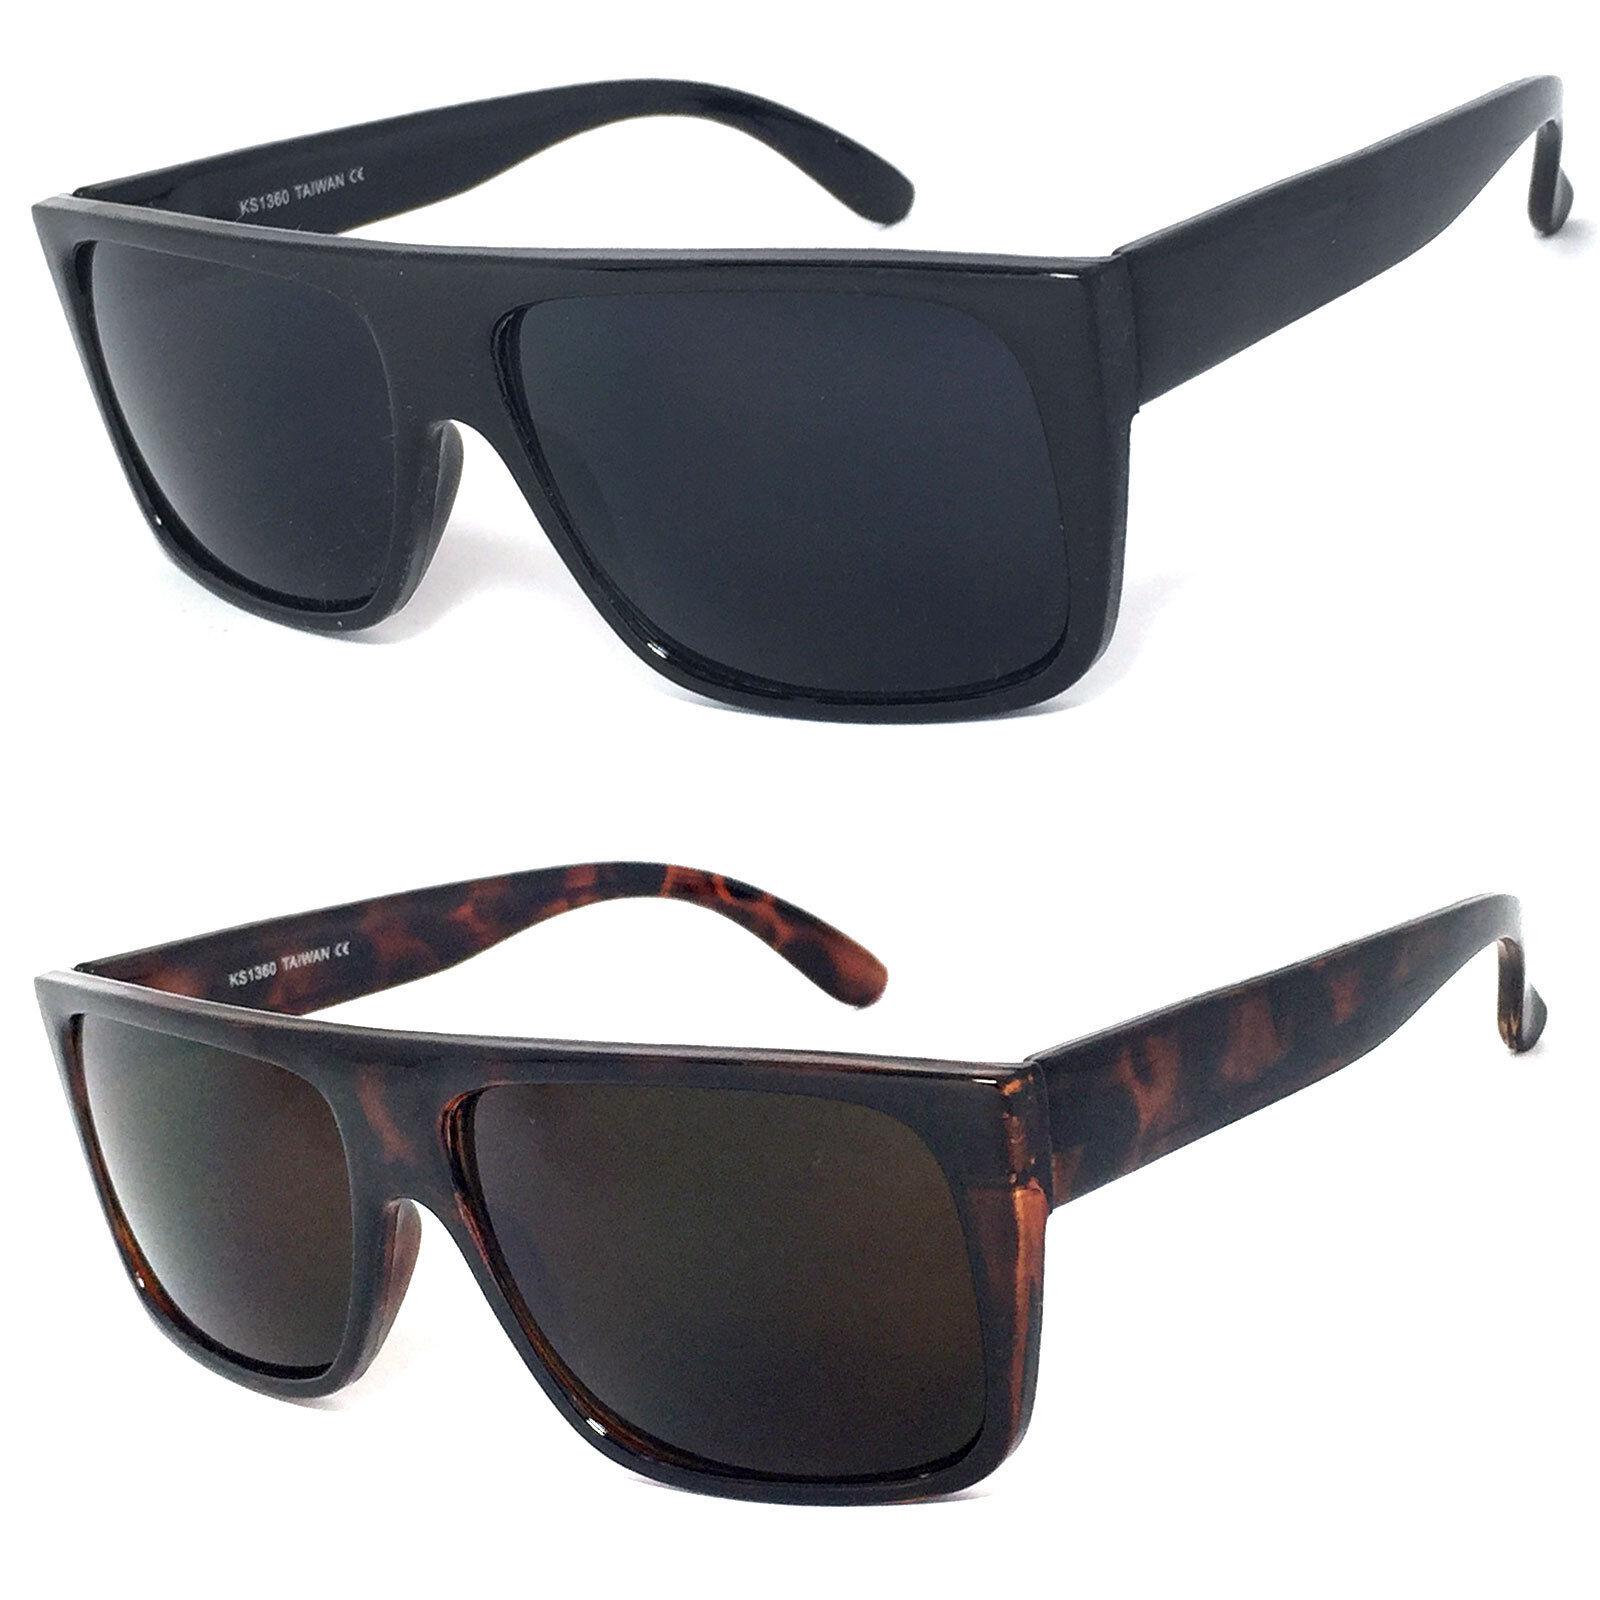 Retro Square Frame Sunglasses Mens Womens Flat Top Square Su